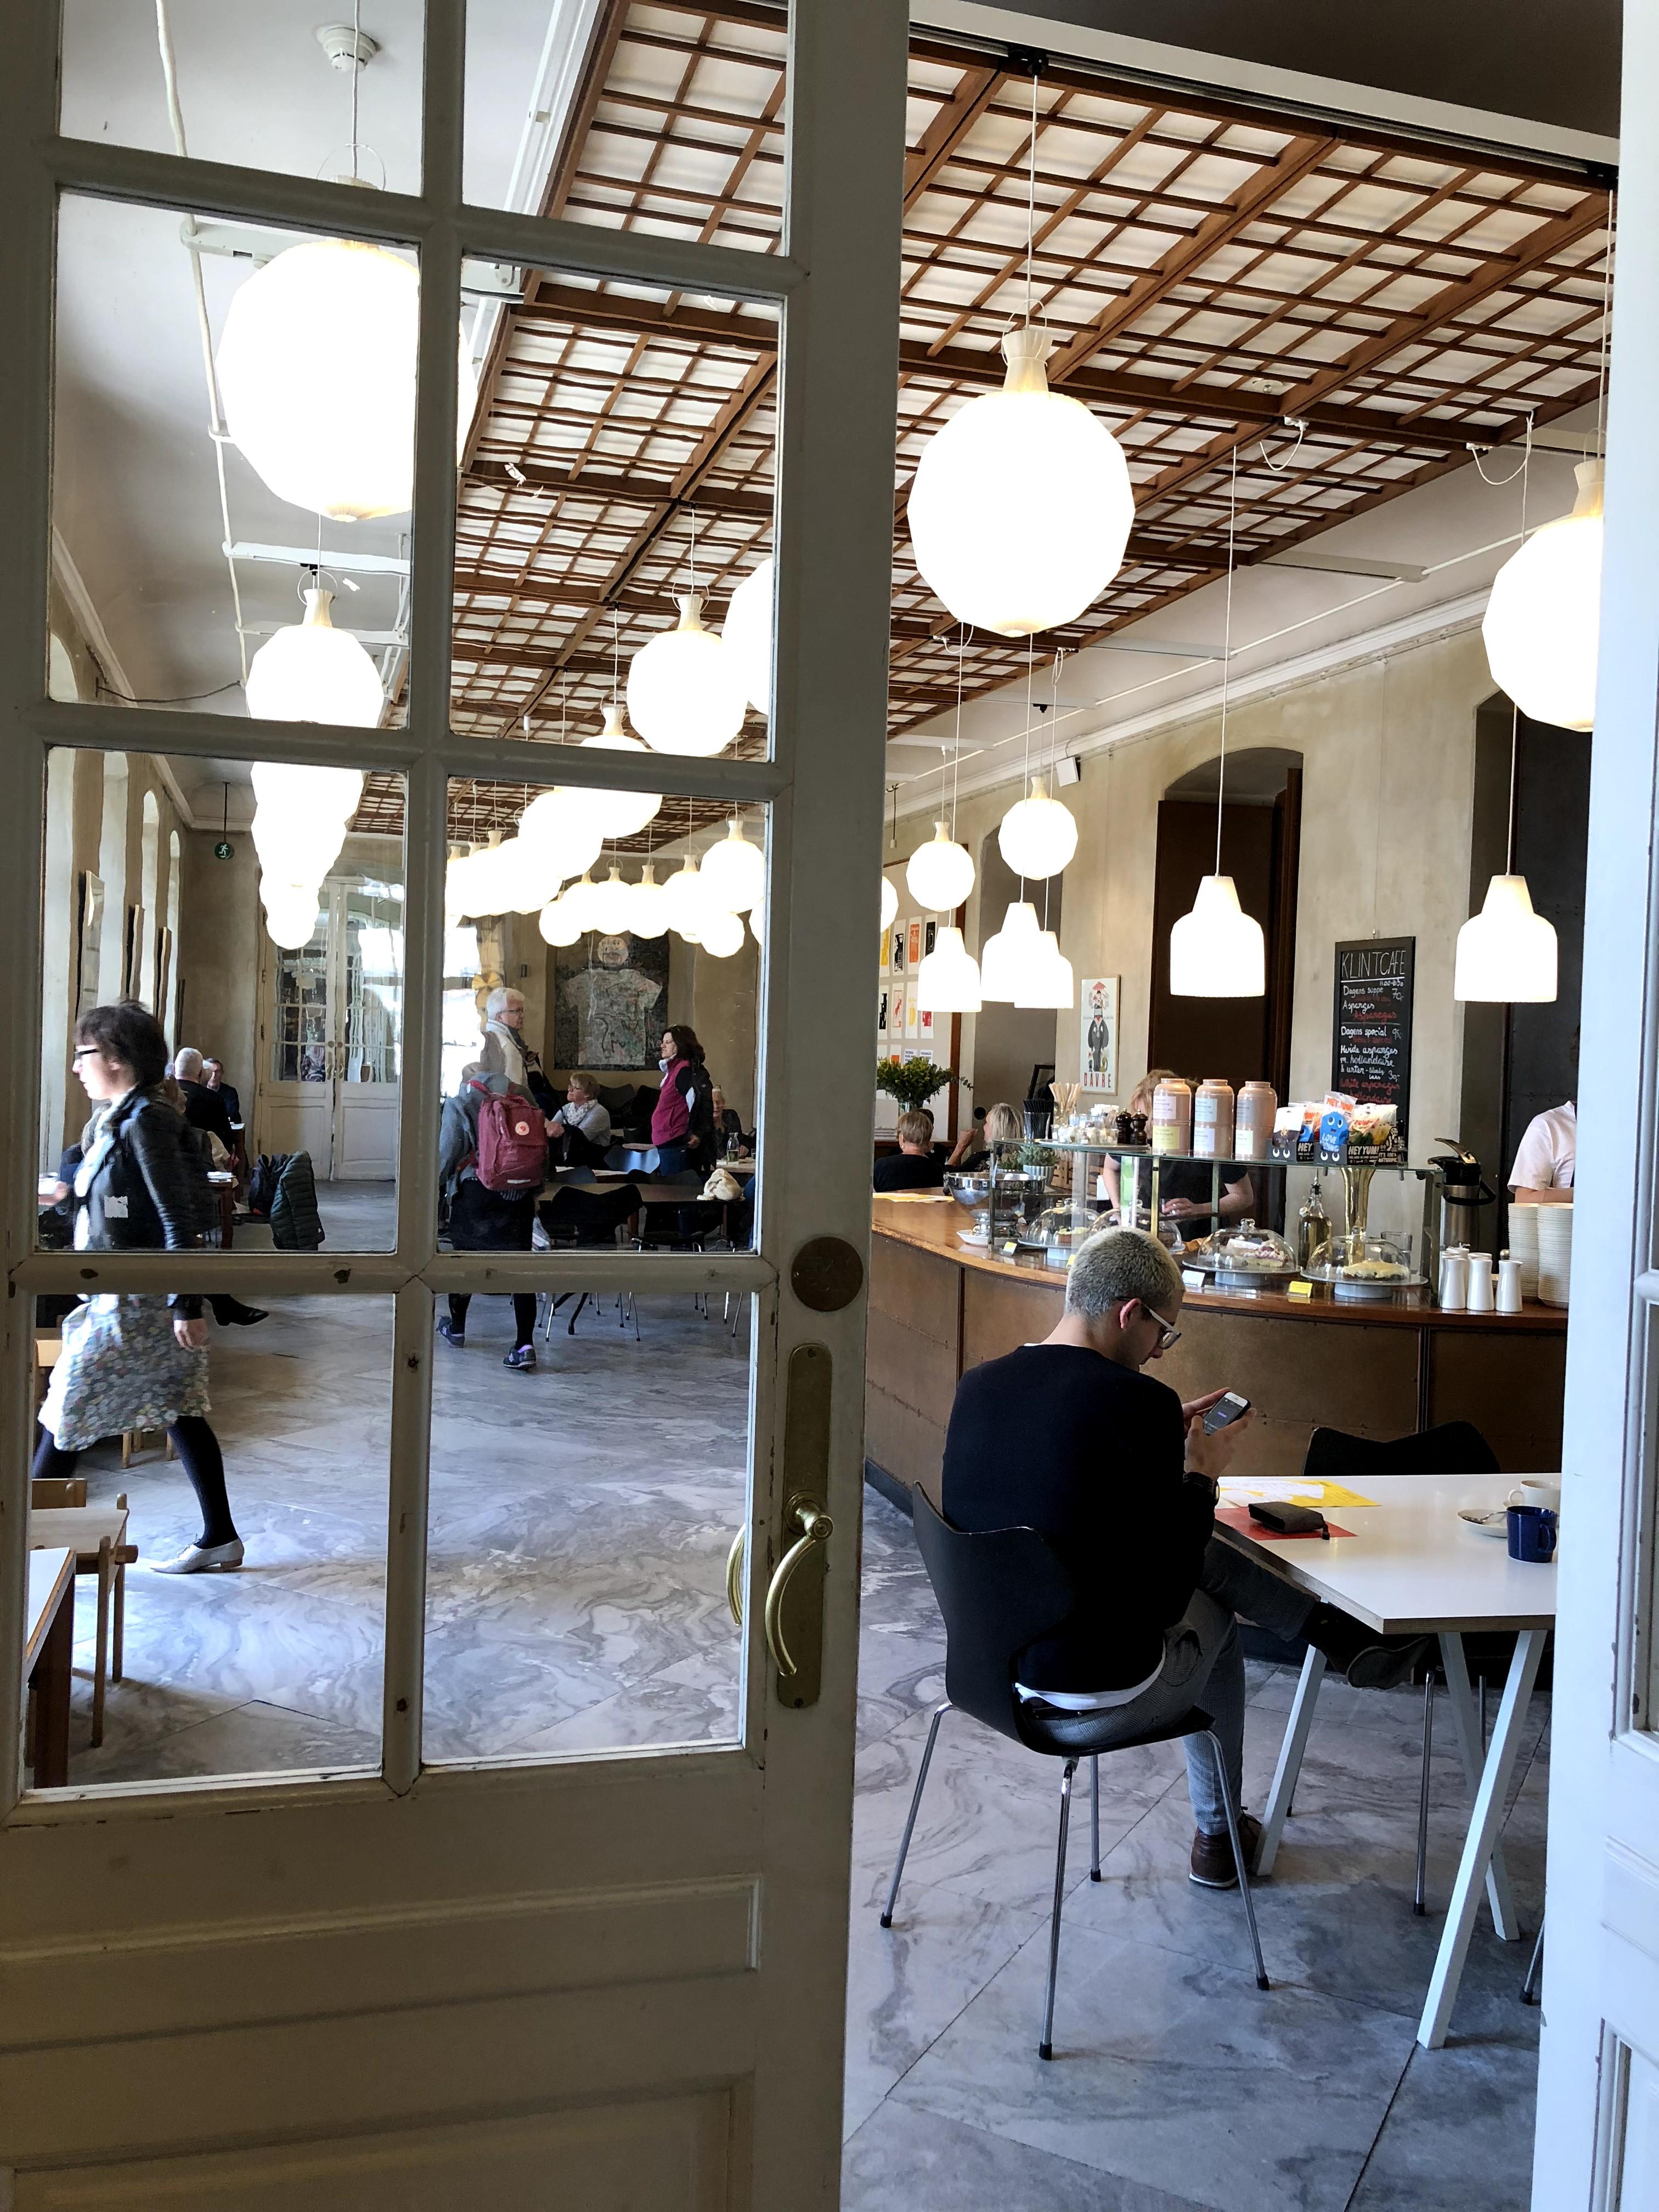 "Denmark_designmuseum_cafe_001"""""